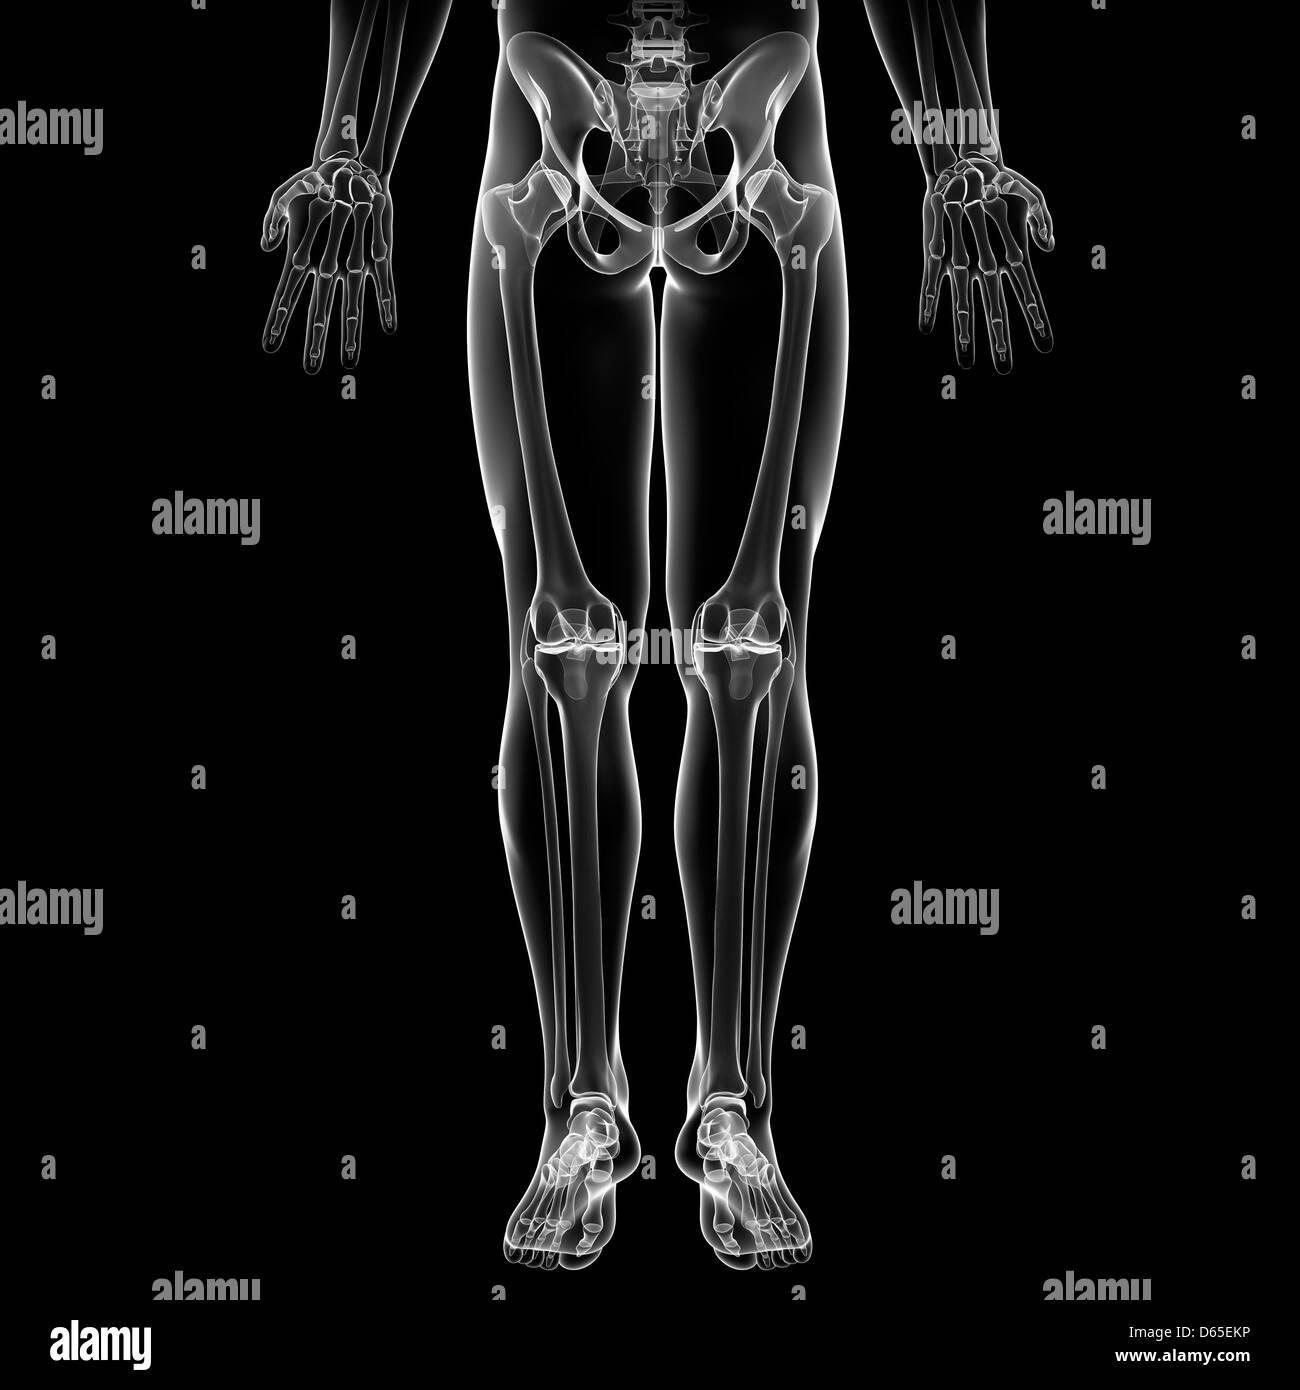 Lower body bones, artwork - Stock Image